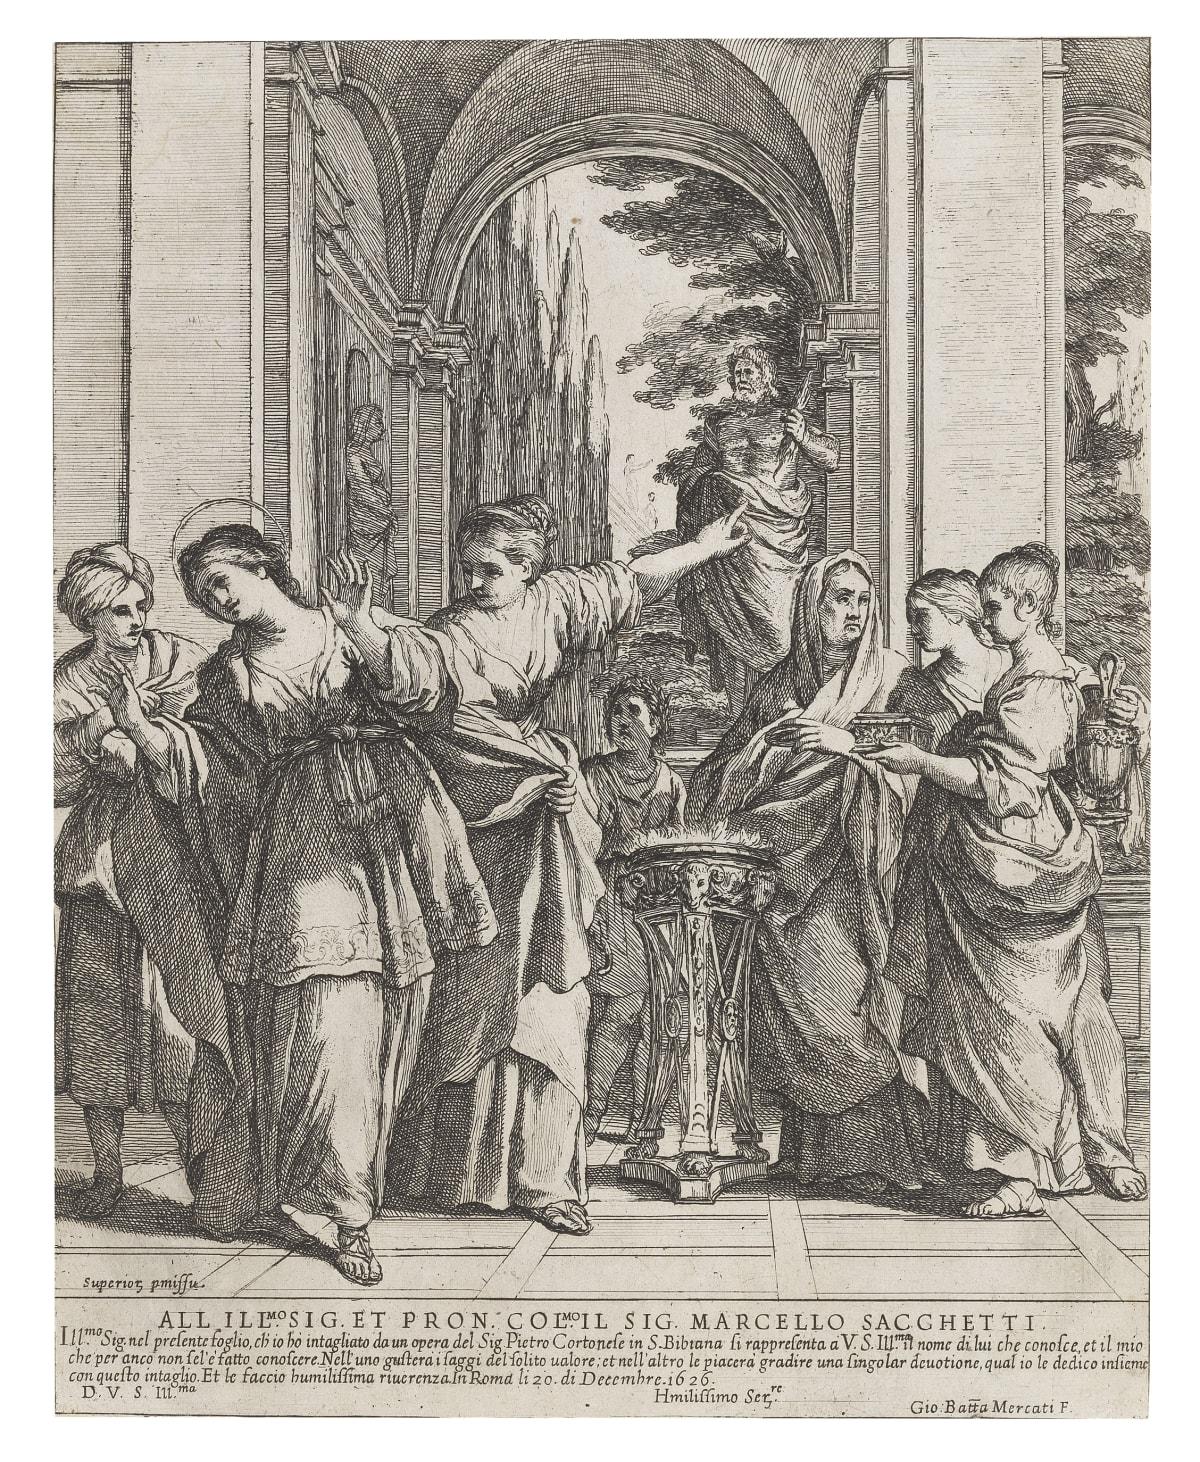 Giovanni Battista Mercati, after Pietro Berrettini (Pietro da Cortona). St Bibiana refusing to sacrifice to the Pagan gods, 1626 Etching Size of sheet: 26.5 x 21.1 cm.